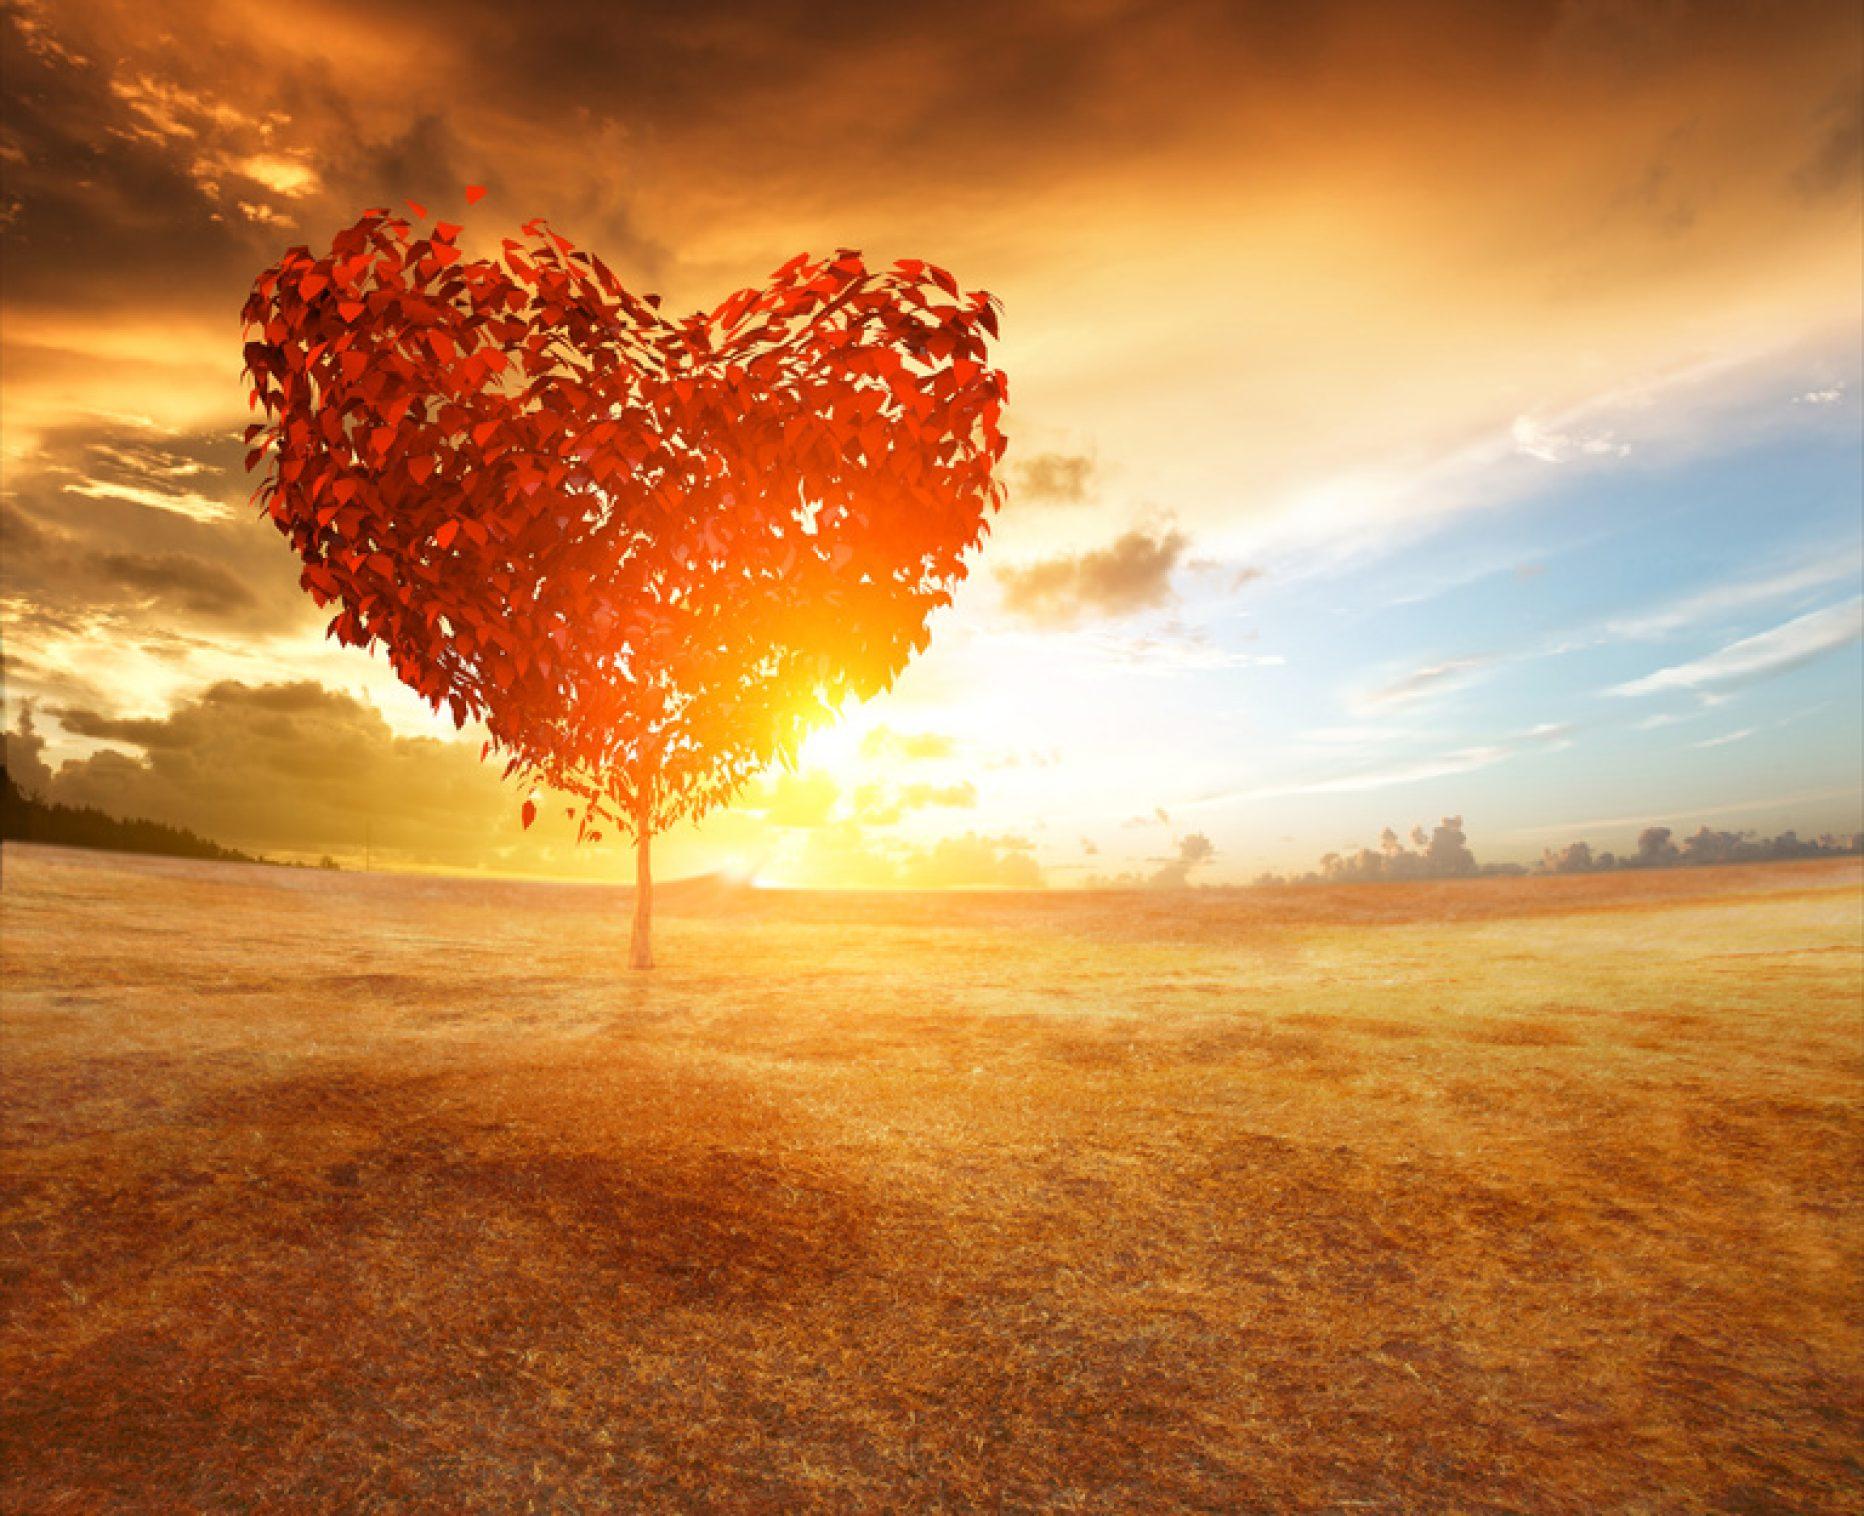 Karnozyna – przyjaciółka serca